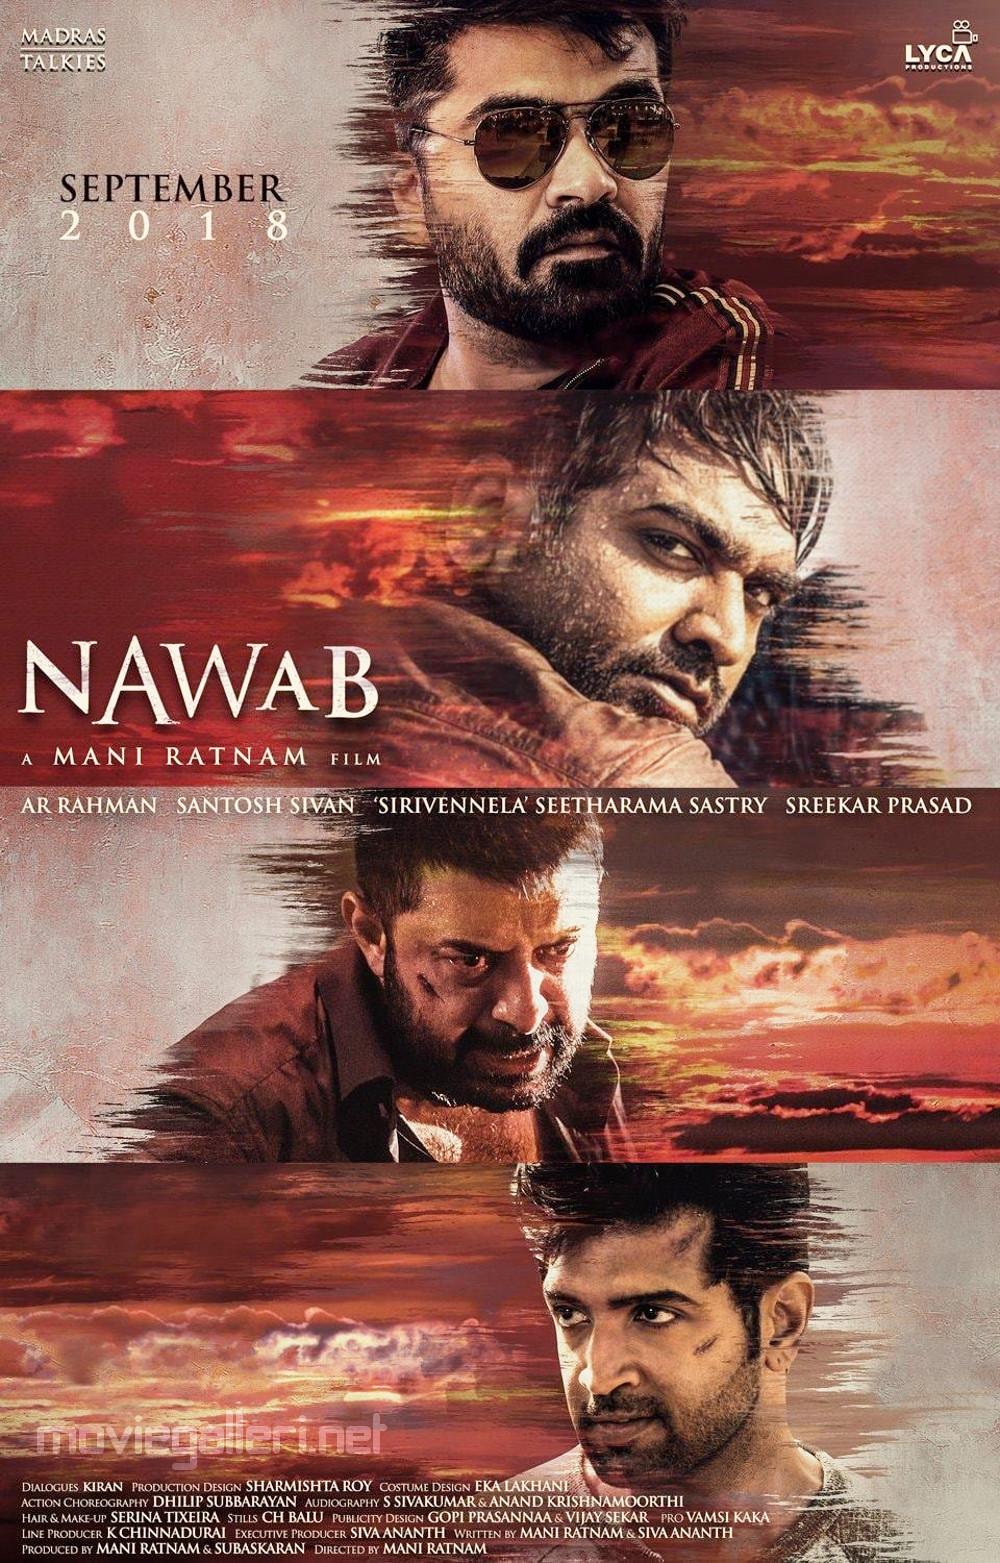 Simbu Vijay Sethupathi Arvind Swami Arun Vijay Nawab Movie Poster HD